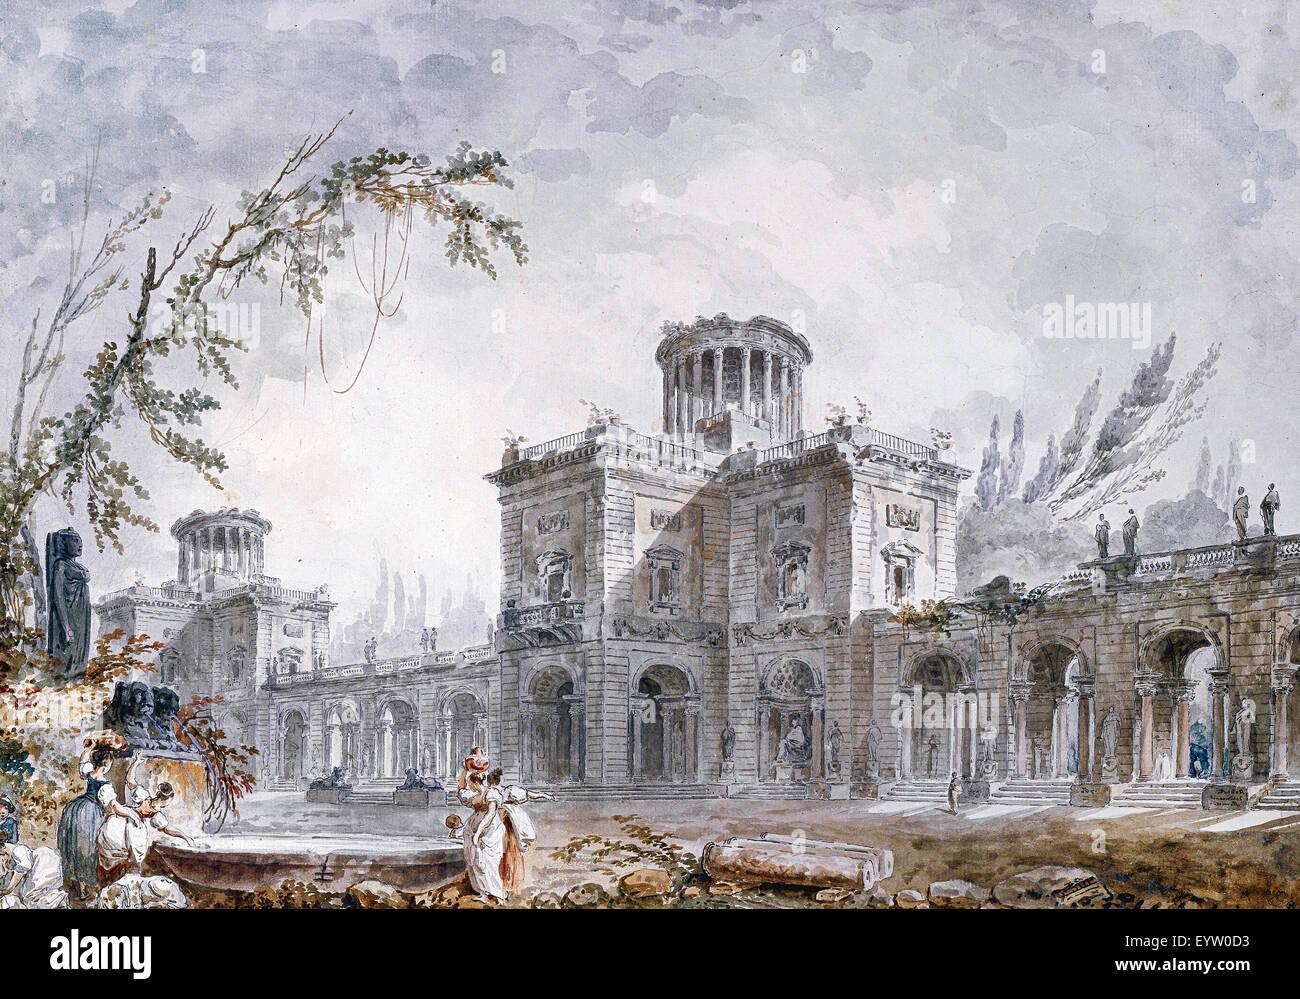 Hubert Robert, architektonische Phantasie 1760 schwarze Kreide, Feder, Tusche, Pinsel, Aquarell. Albertina, Wien, Stockbild